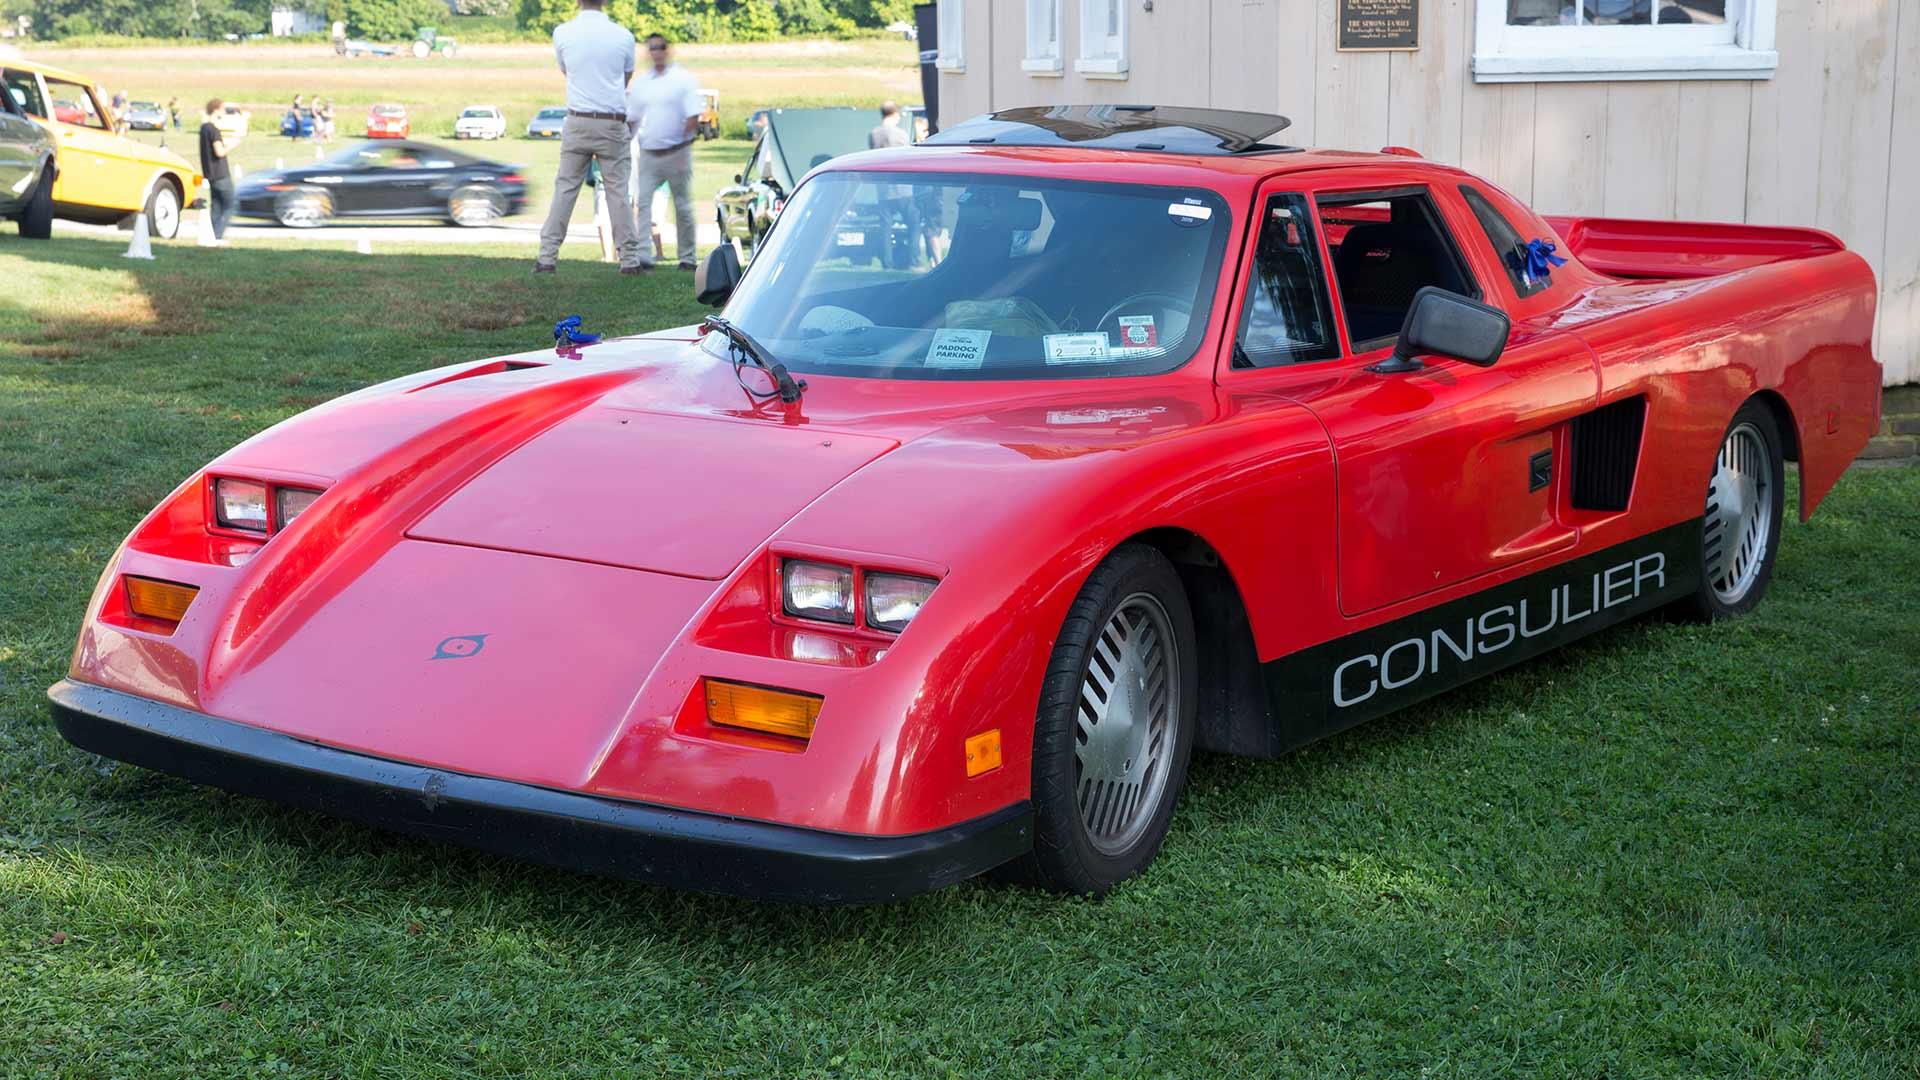 1985 Consulier GTP